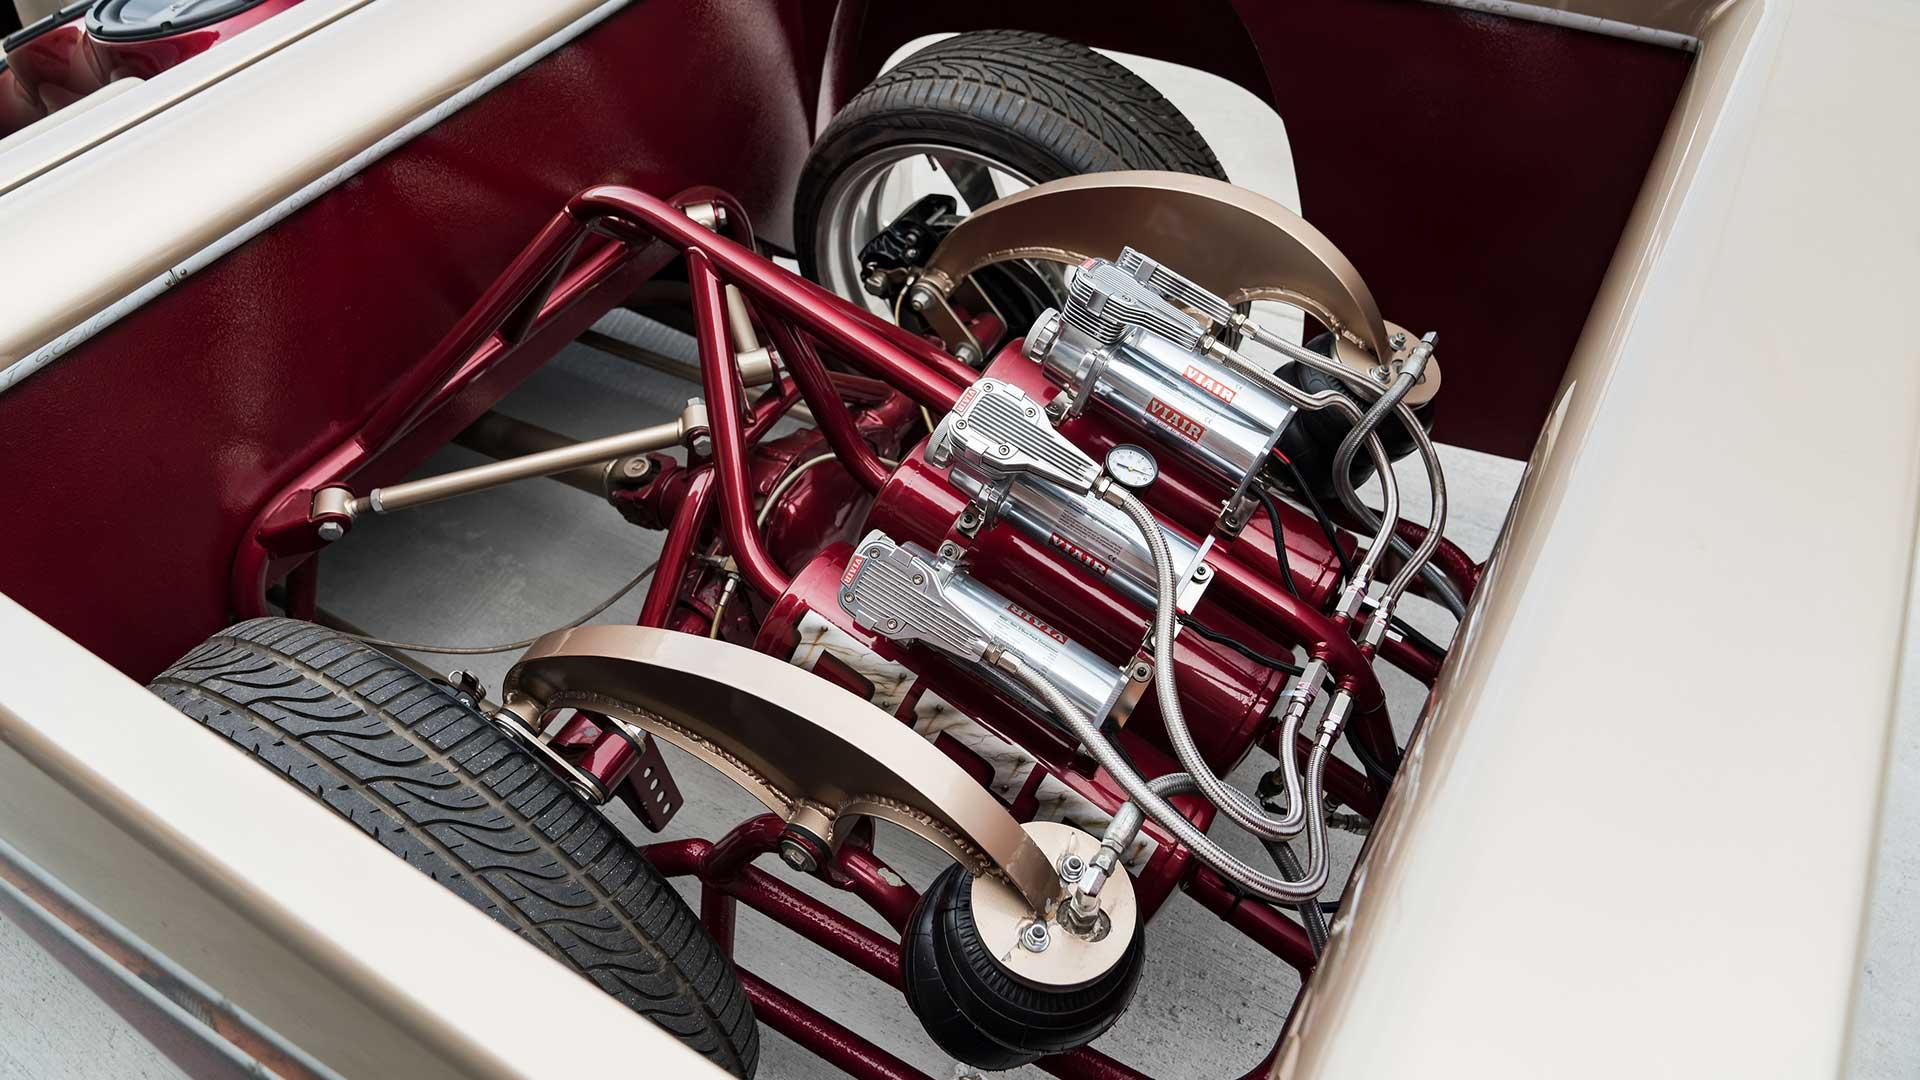 Airride en draagarmen Chevrolet Colorado Custom (Cool Cars Engineering)